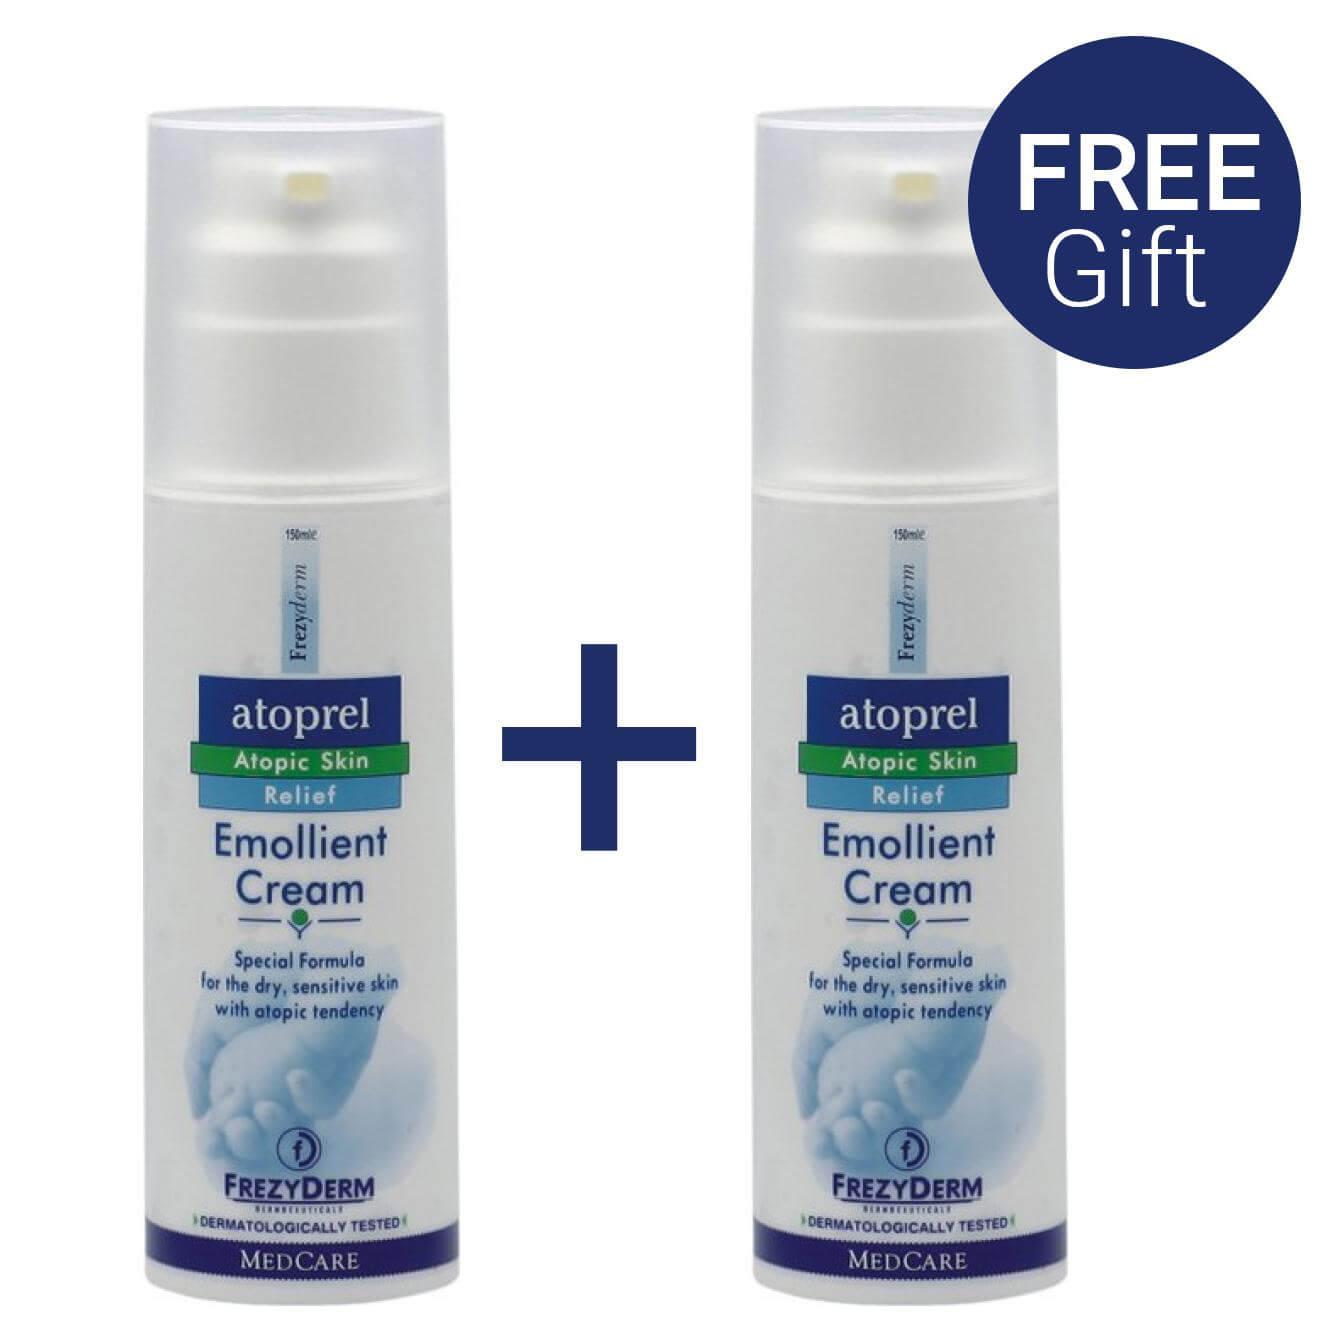 Frezyderm Atoprel Emollient Cream Κρέμα για Ξηρό Δέρμα με Ατοπική Προδιάθεση 150ml & Δώρο Επιλέον Ποσότητα 80ml